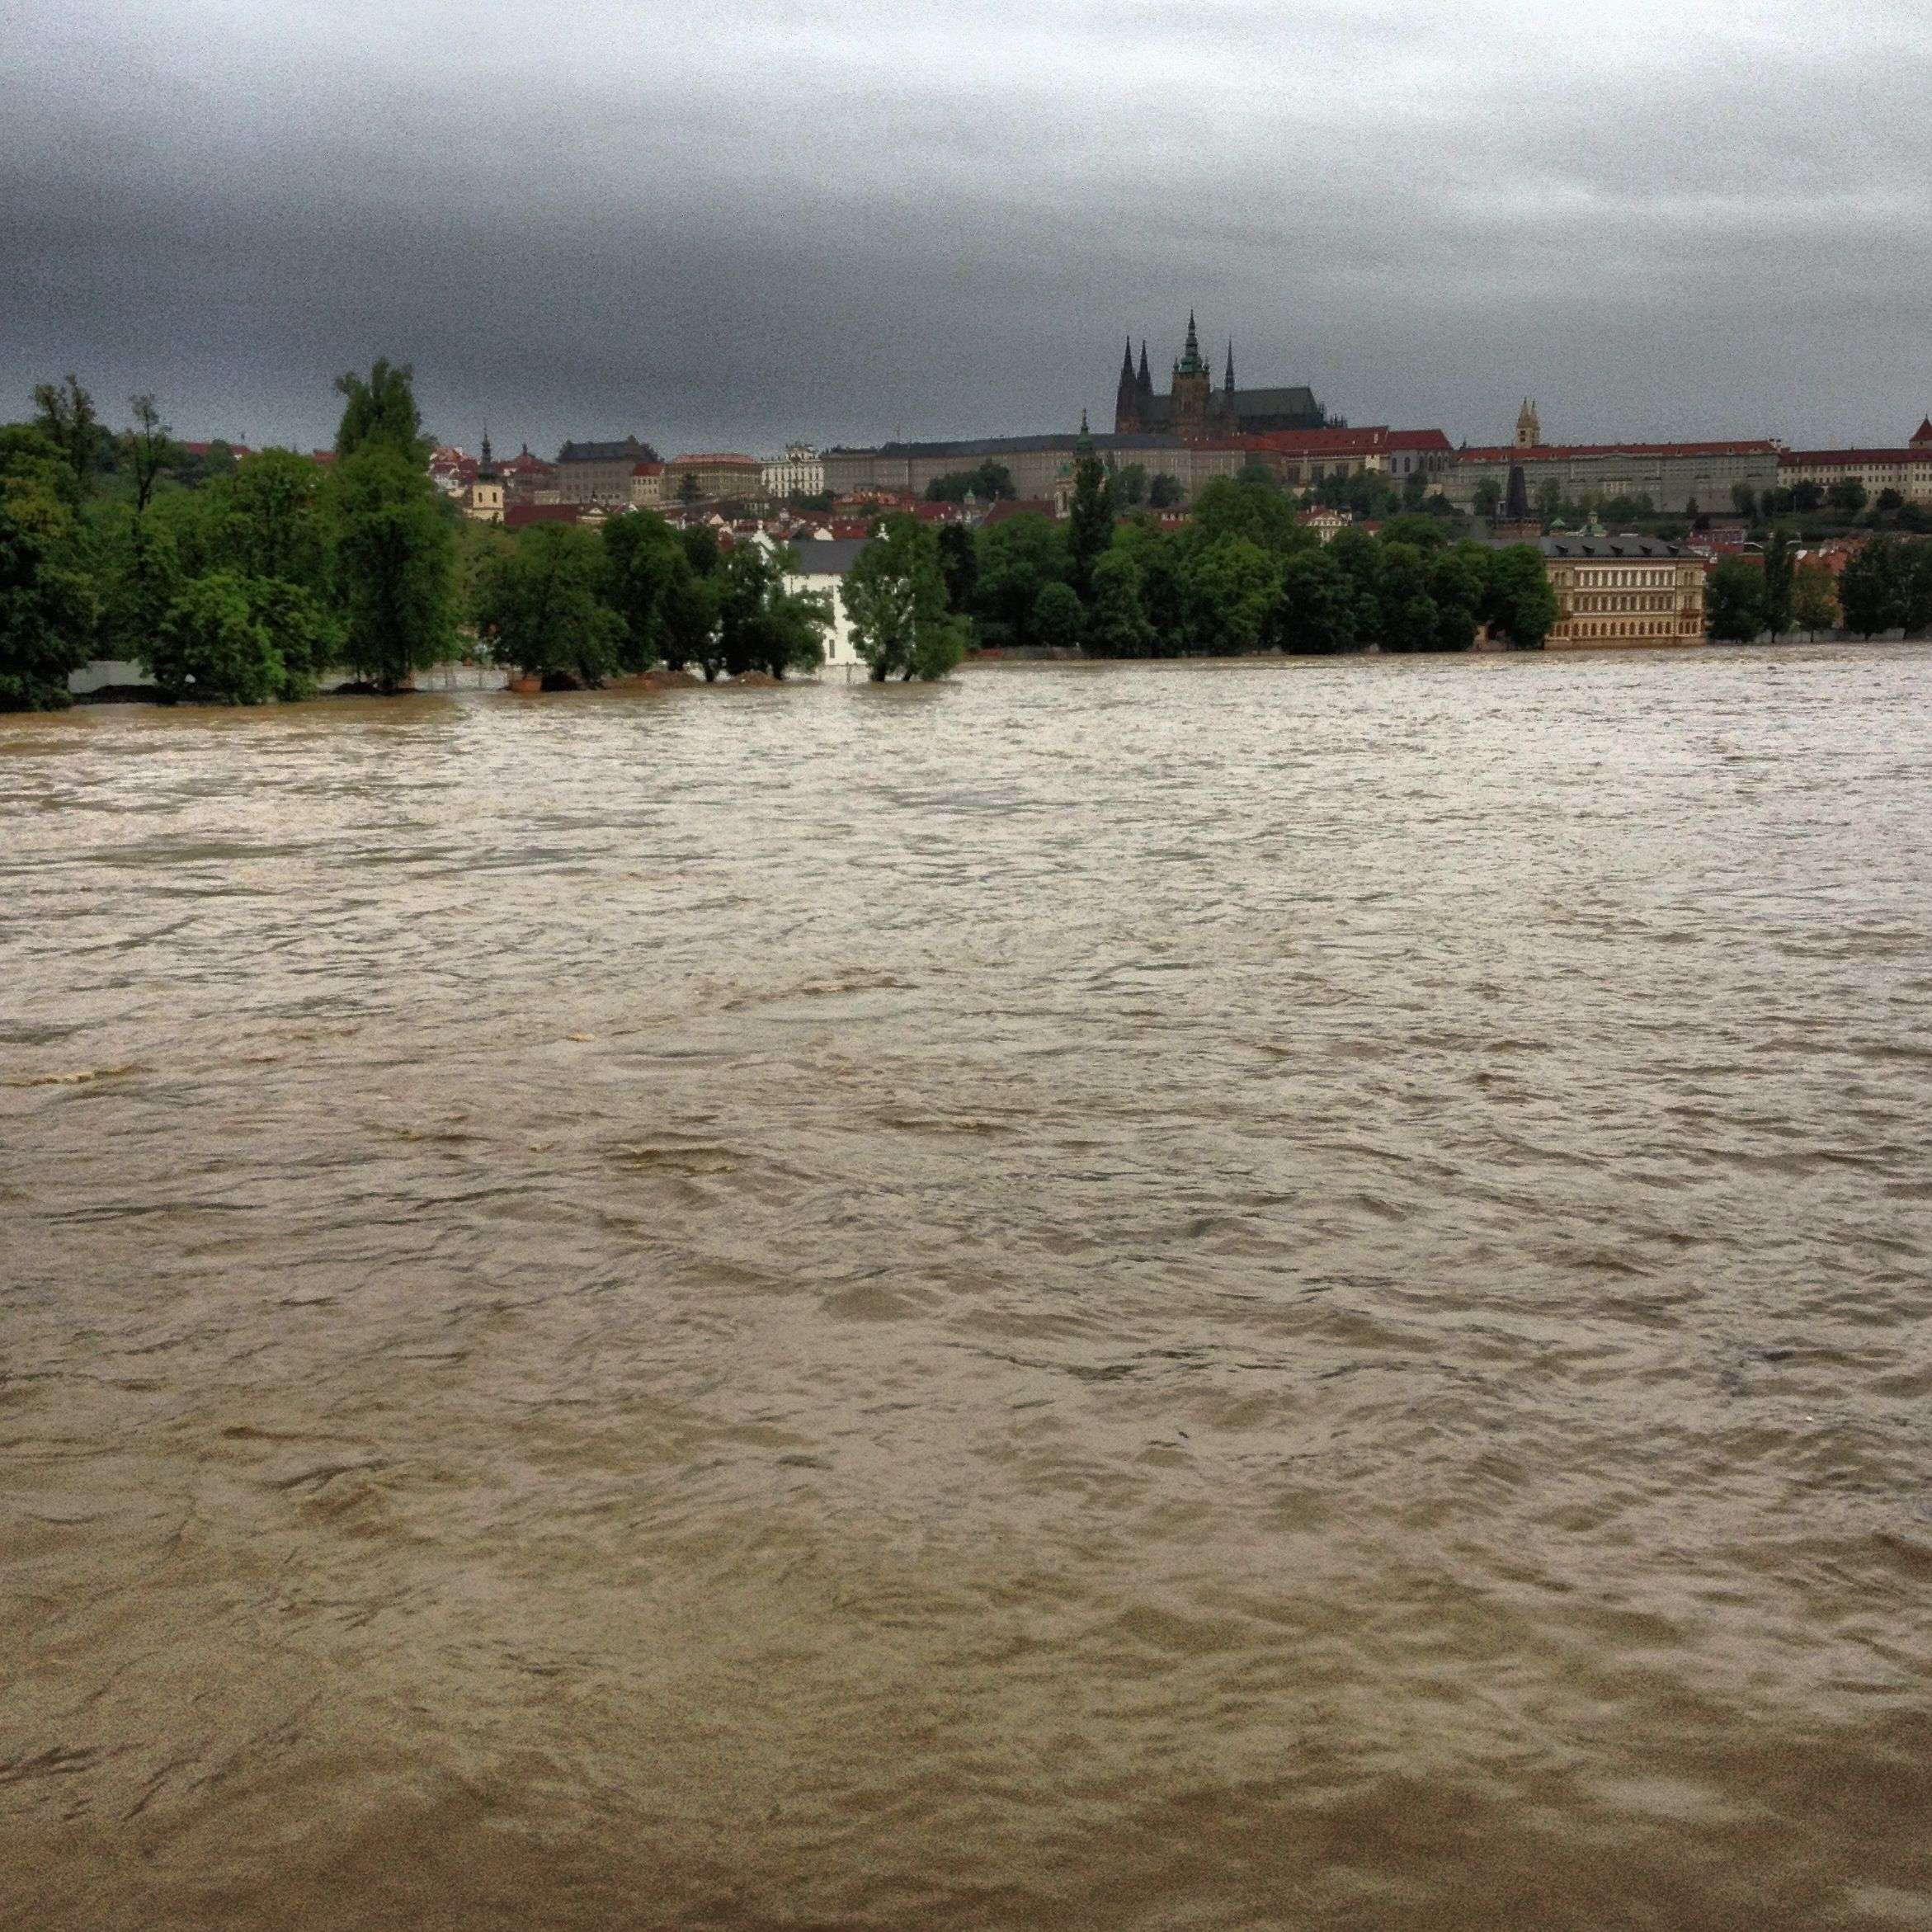 Prague (June 2, 2013)